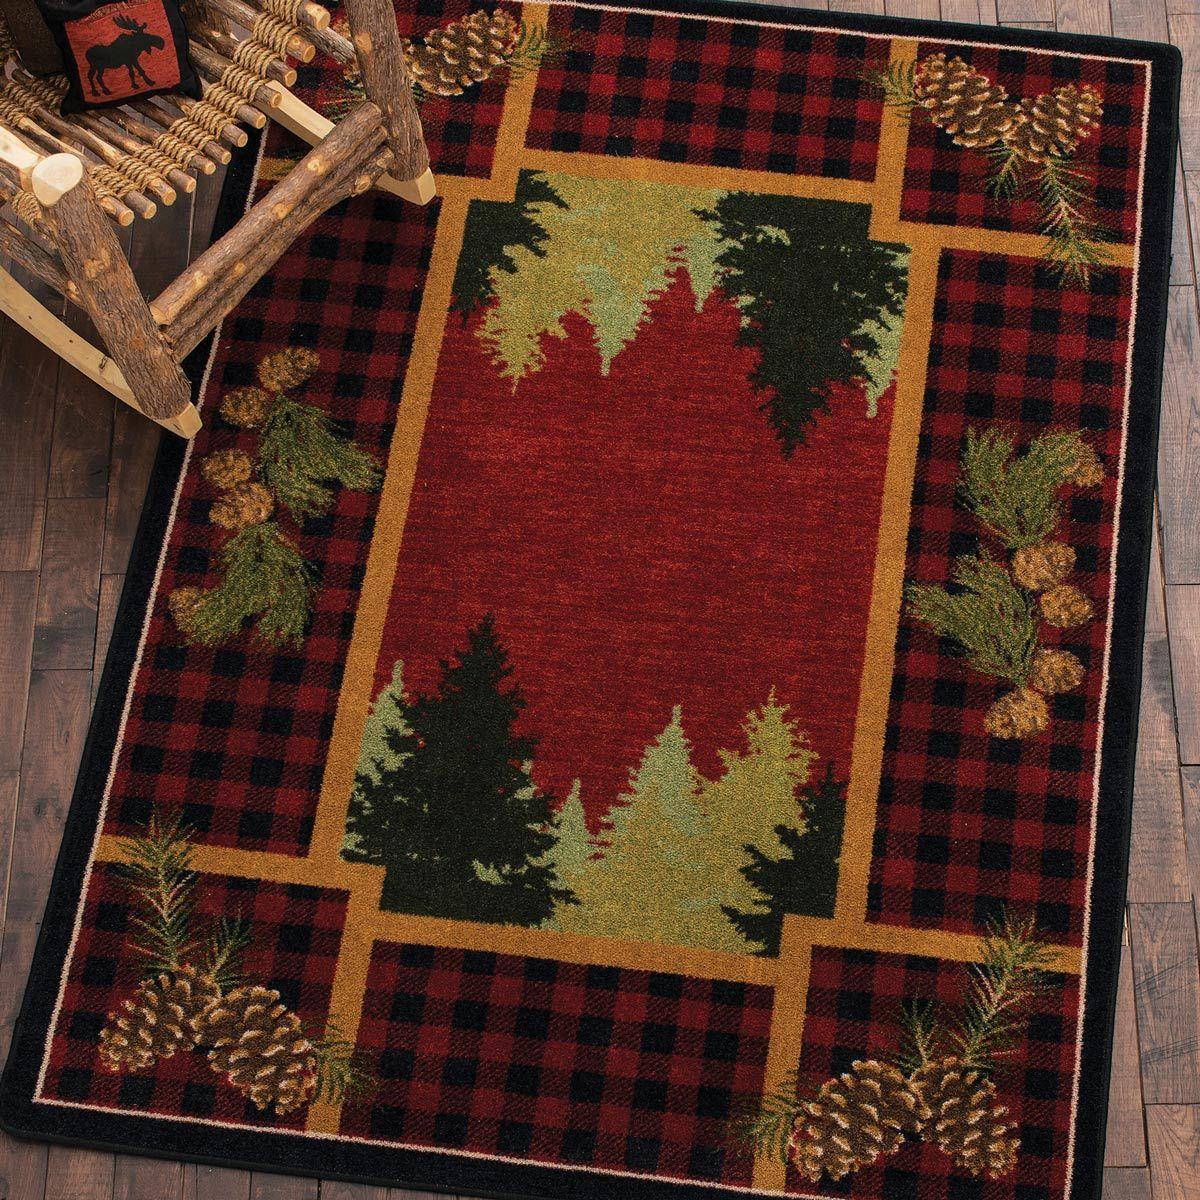 Plaid Woodsman Rug 5 X 8 Black Forest Decor Rugs Cabin Rugs